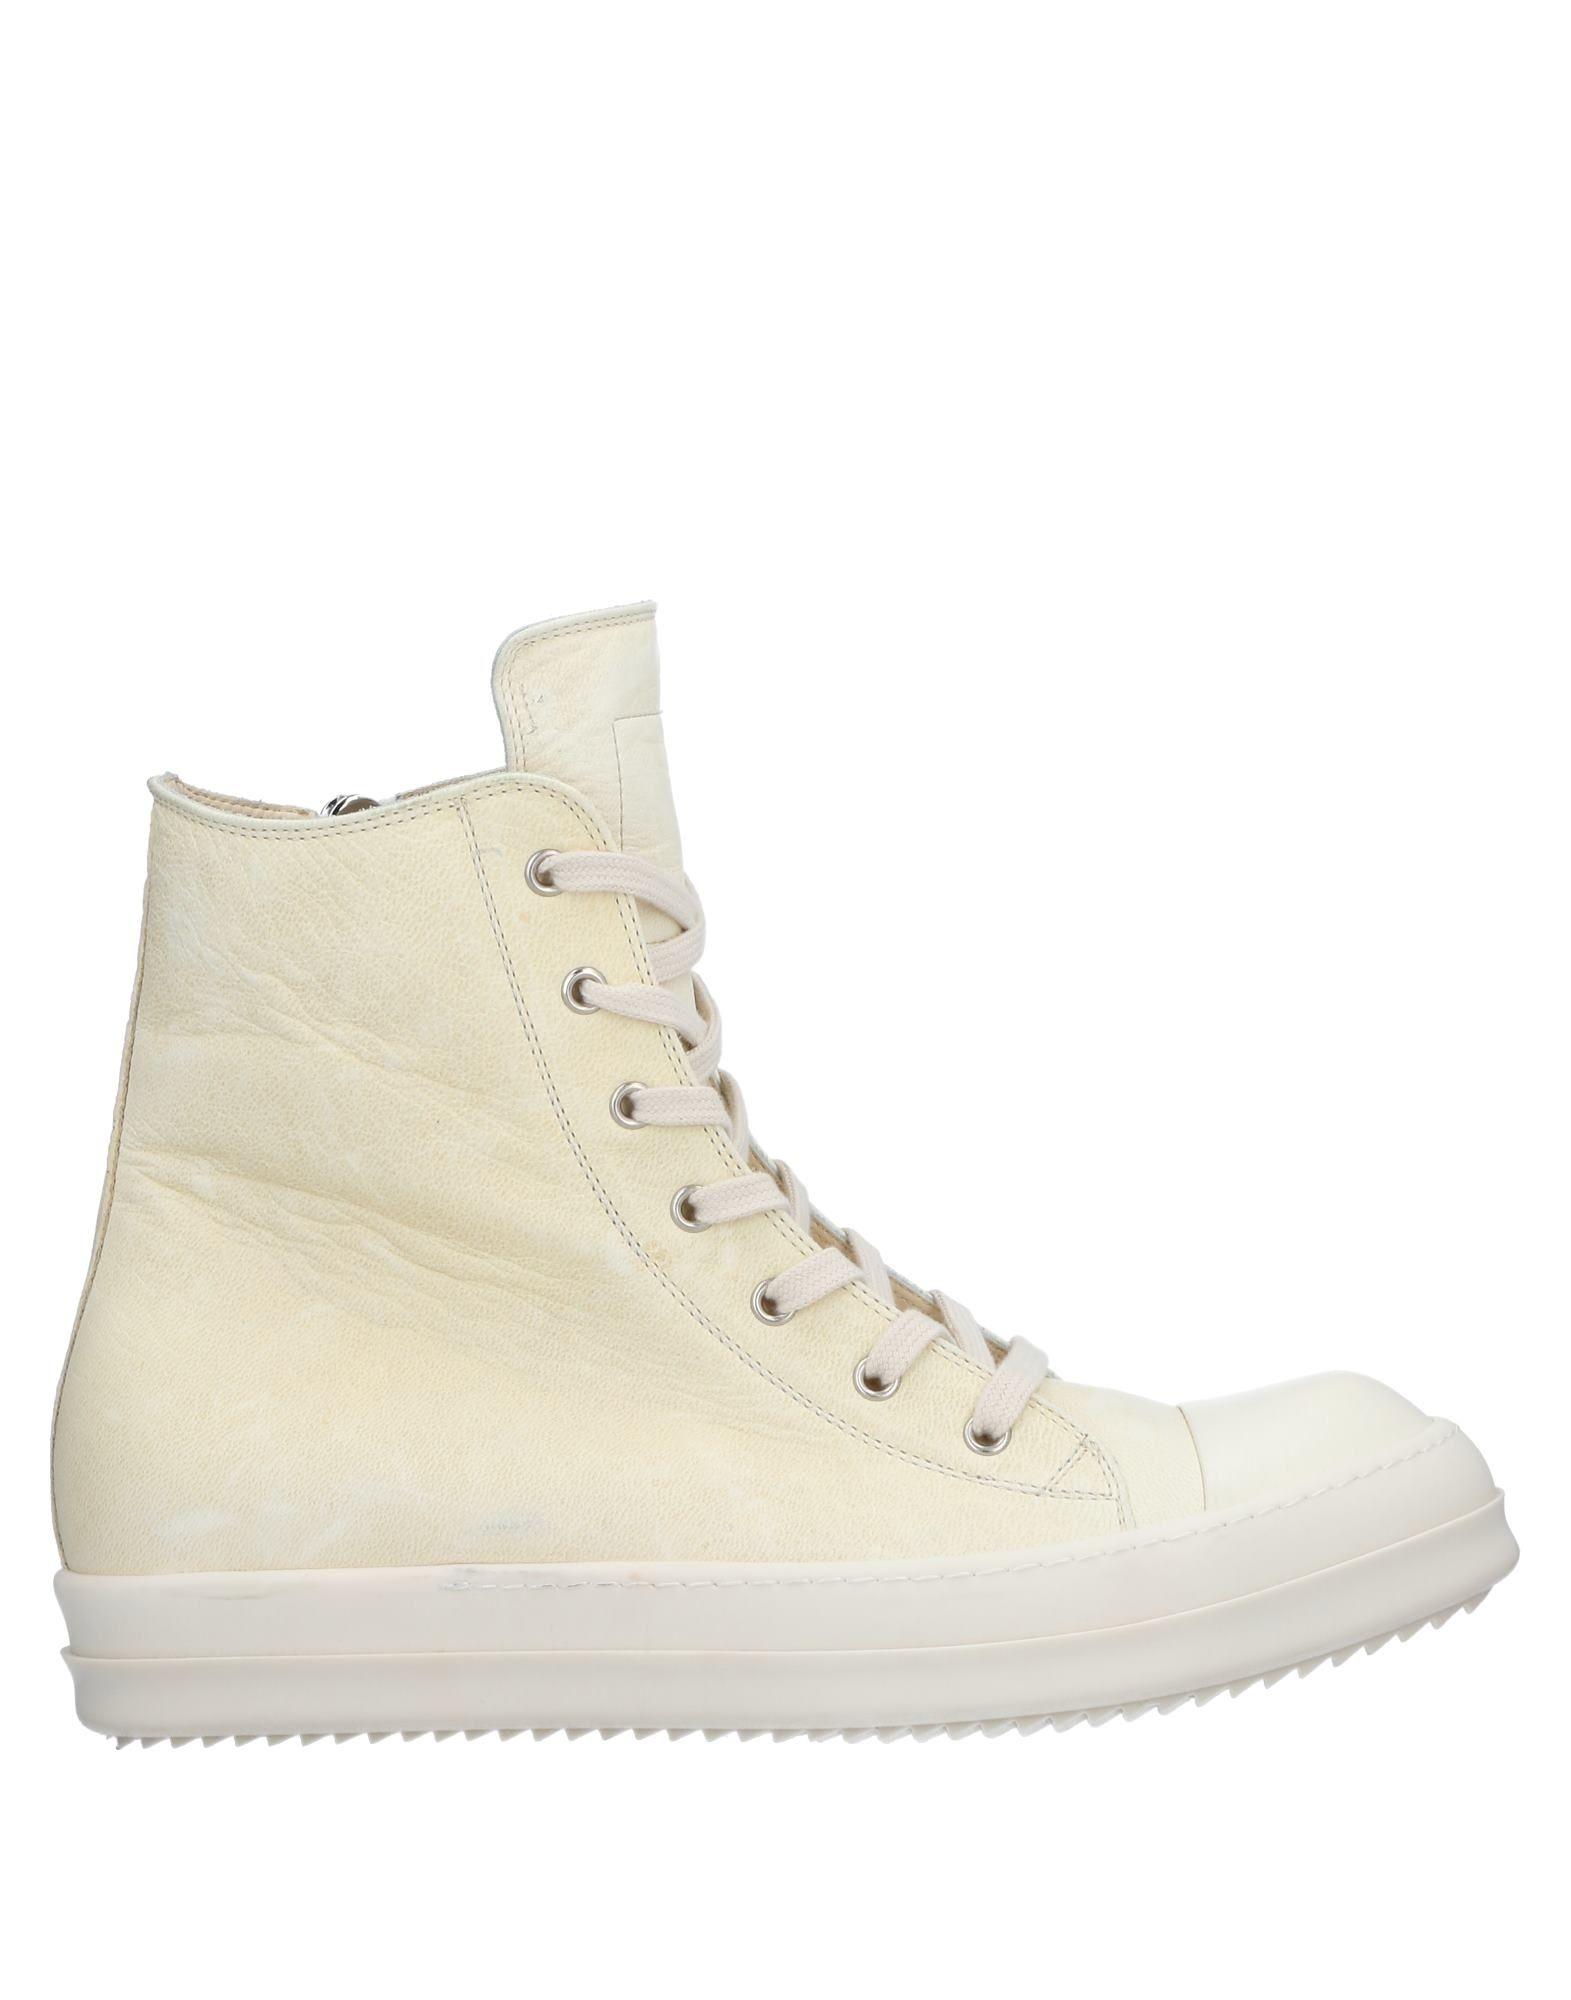 Rick Owens Sneakers Herren  11518052FT Gute Qualität beliebte Schuhe